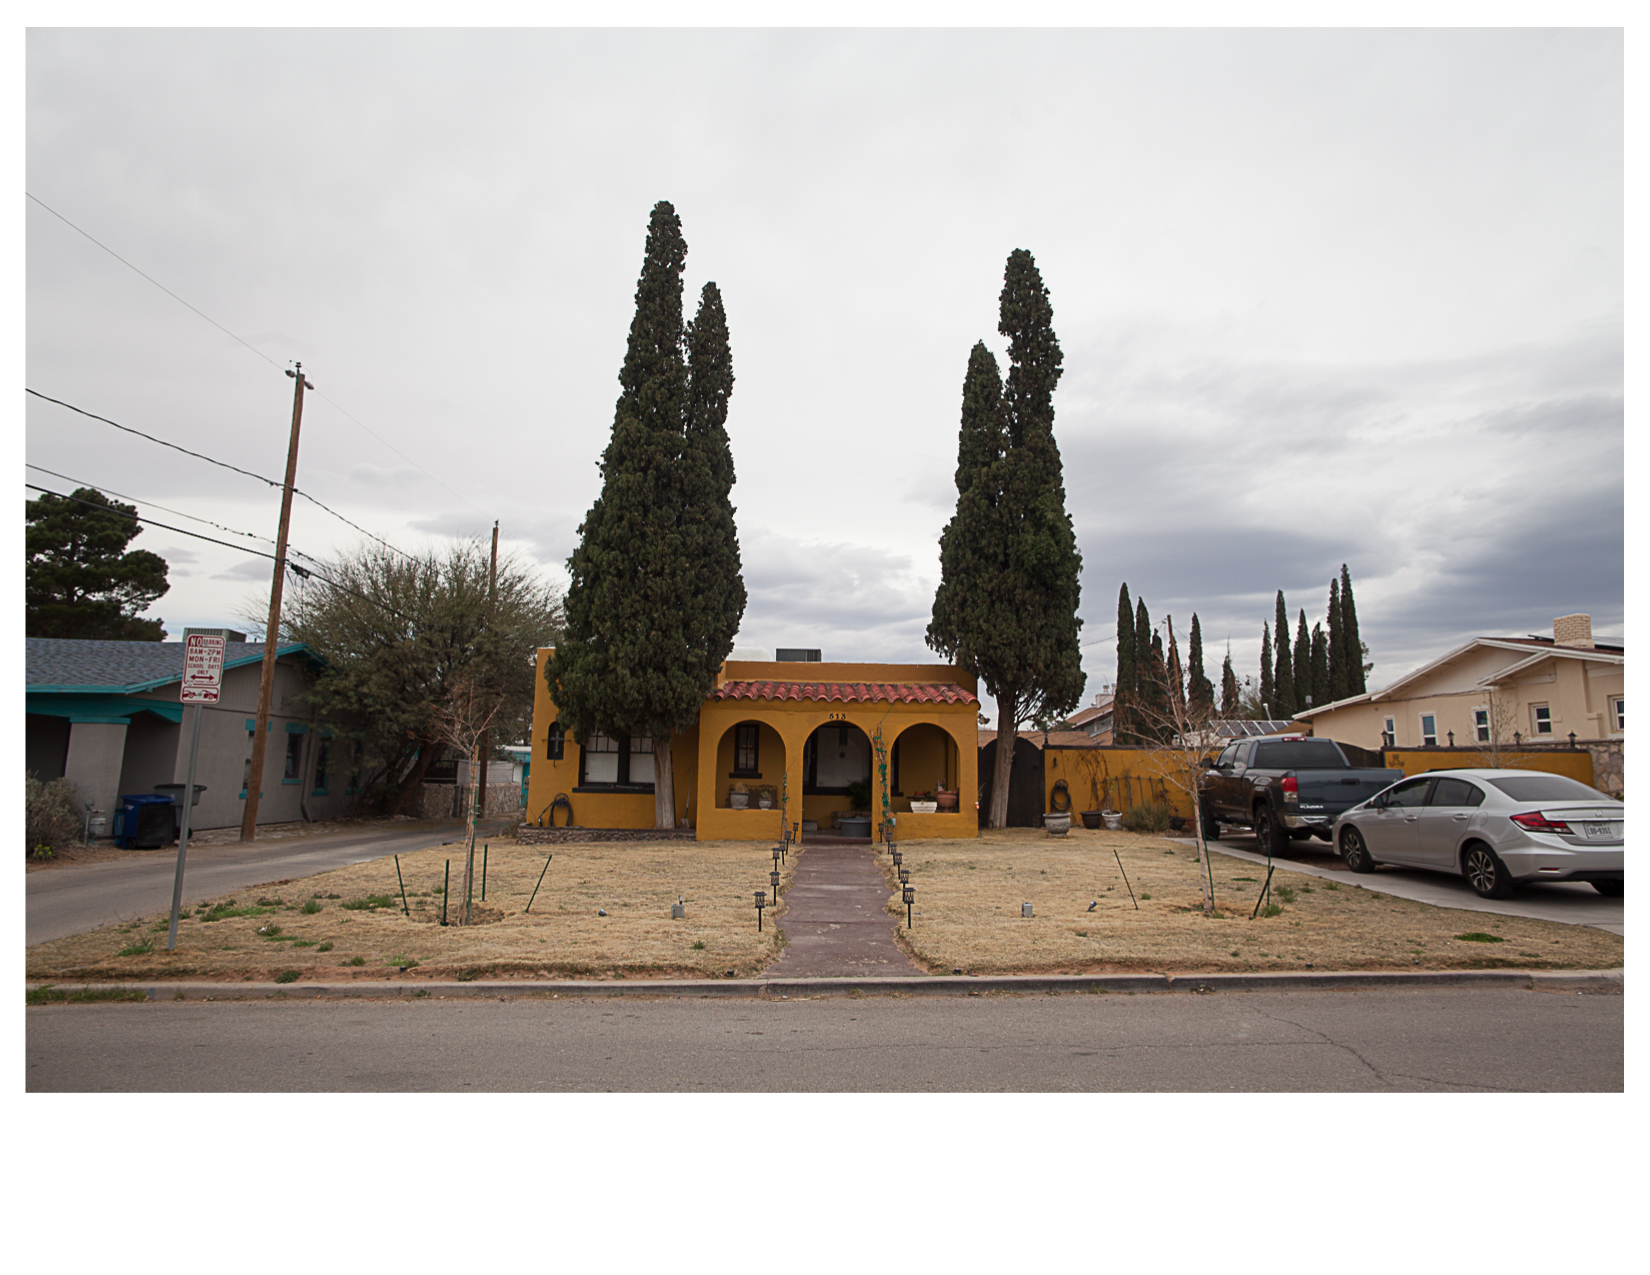 House and Trees, Rim-University Neighborhood, El Paso, TX